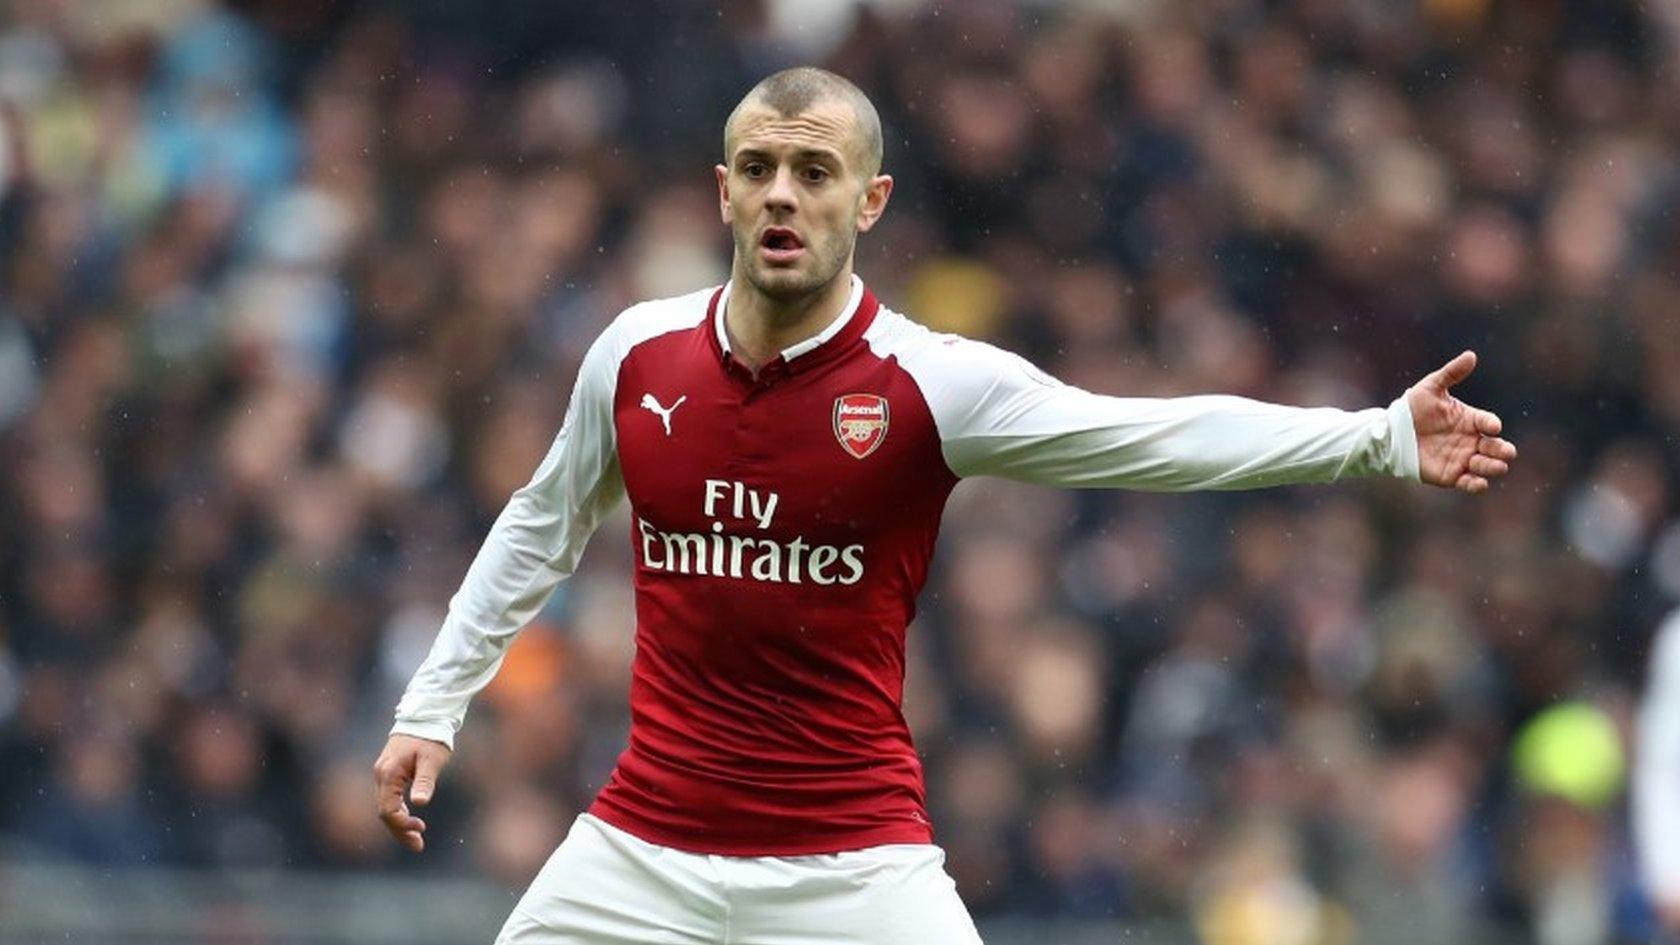 Arsenal and Emirates in £200m shirt sponsorship extension